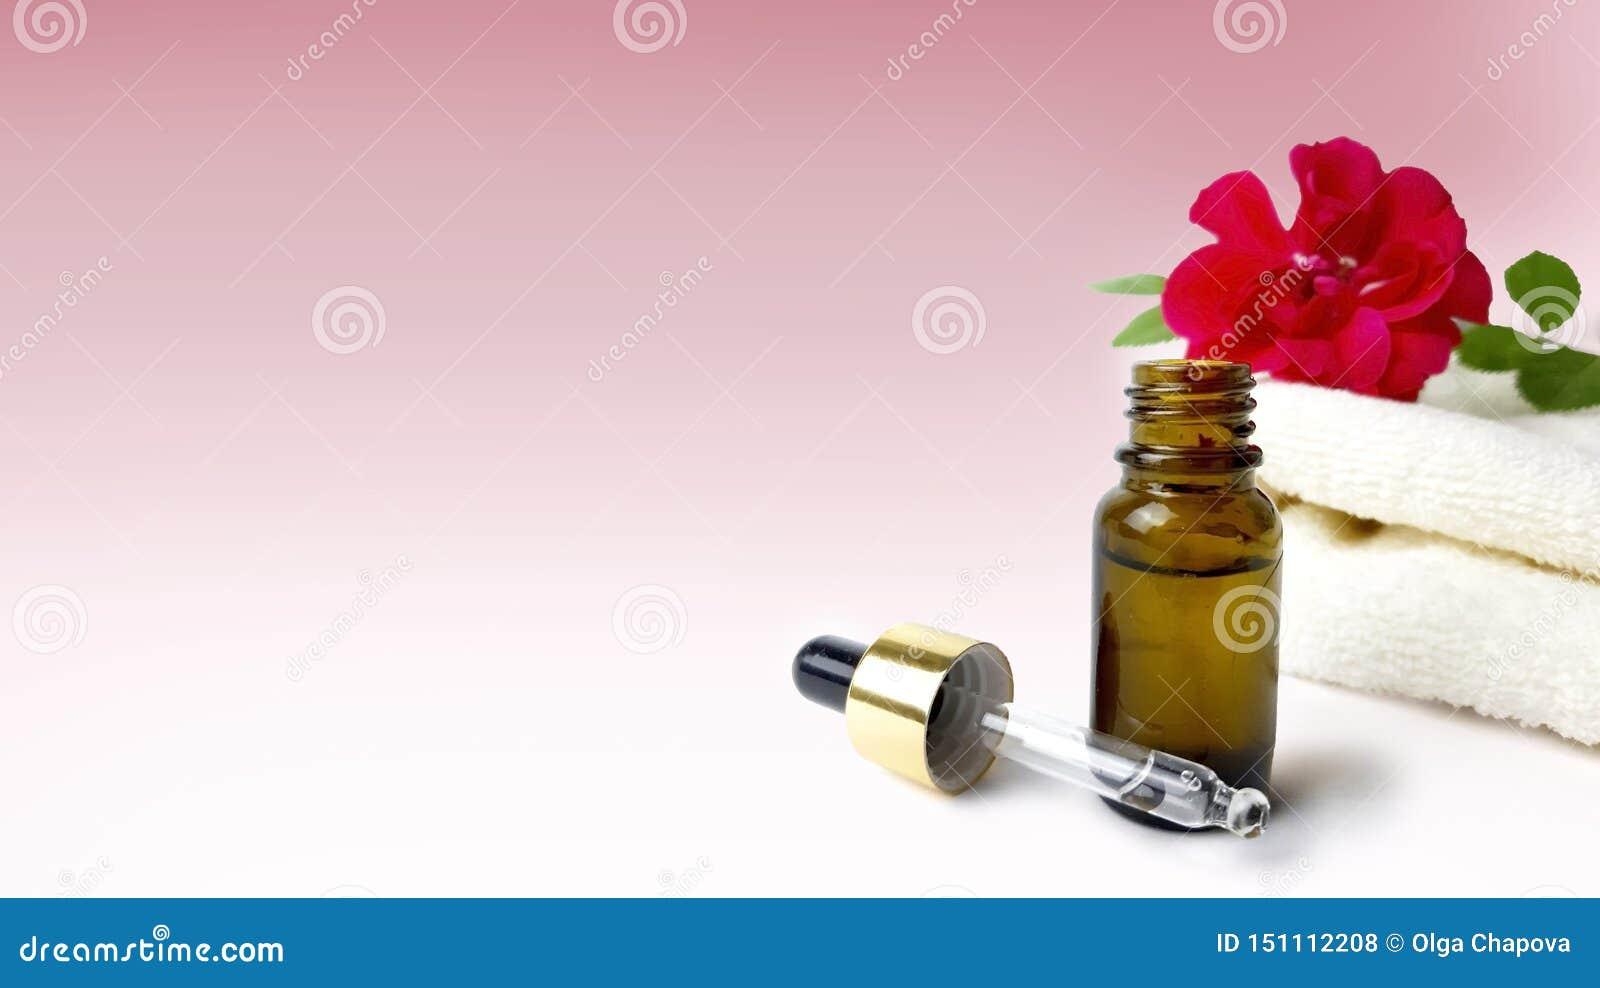 Rosas, toalla, botella de aceite esencial en fondo rosado